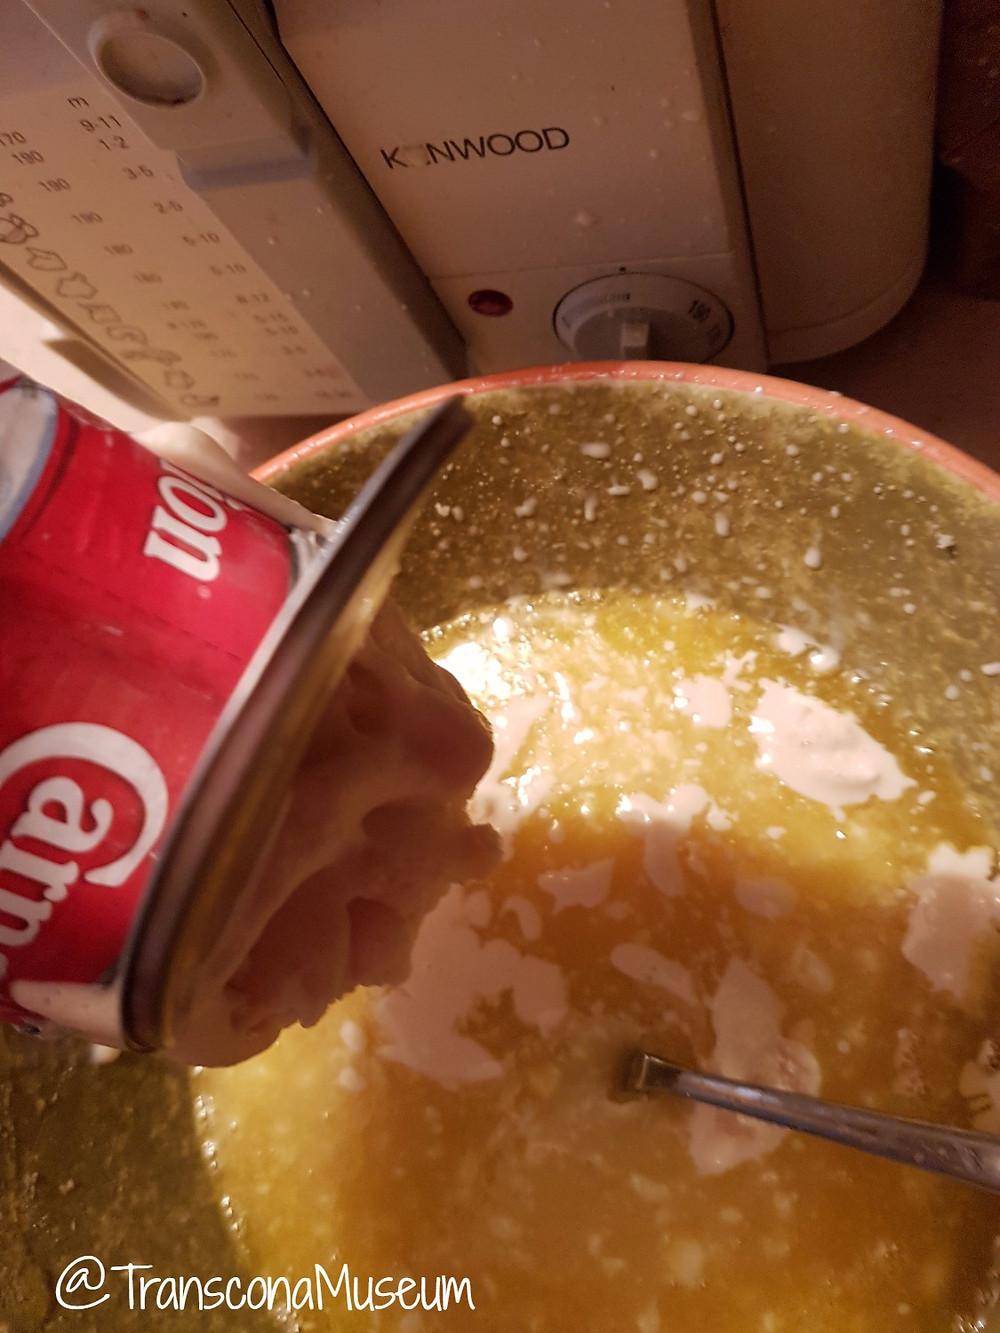 Adding frozen condensed milk to jello